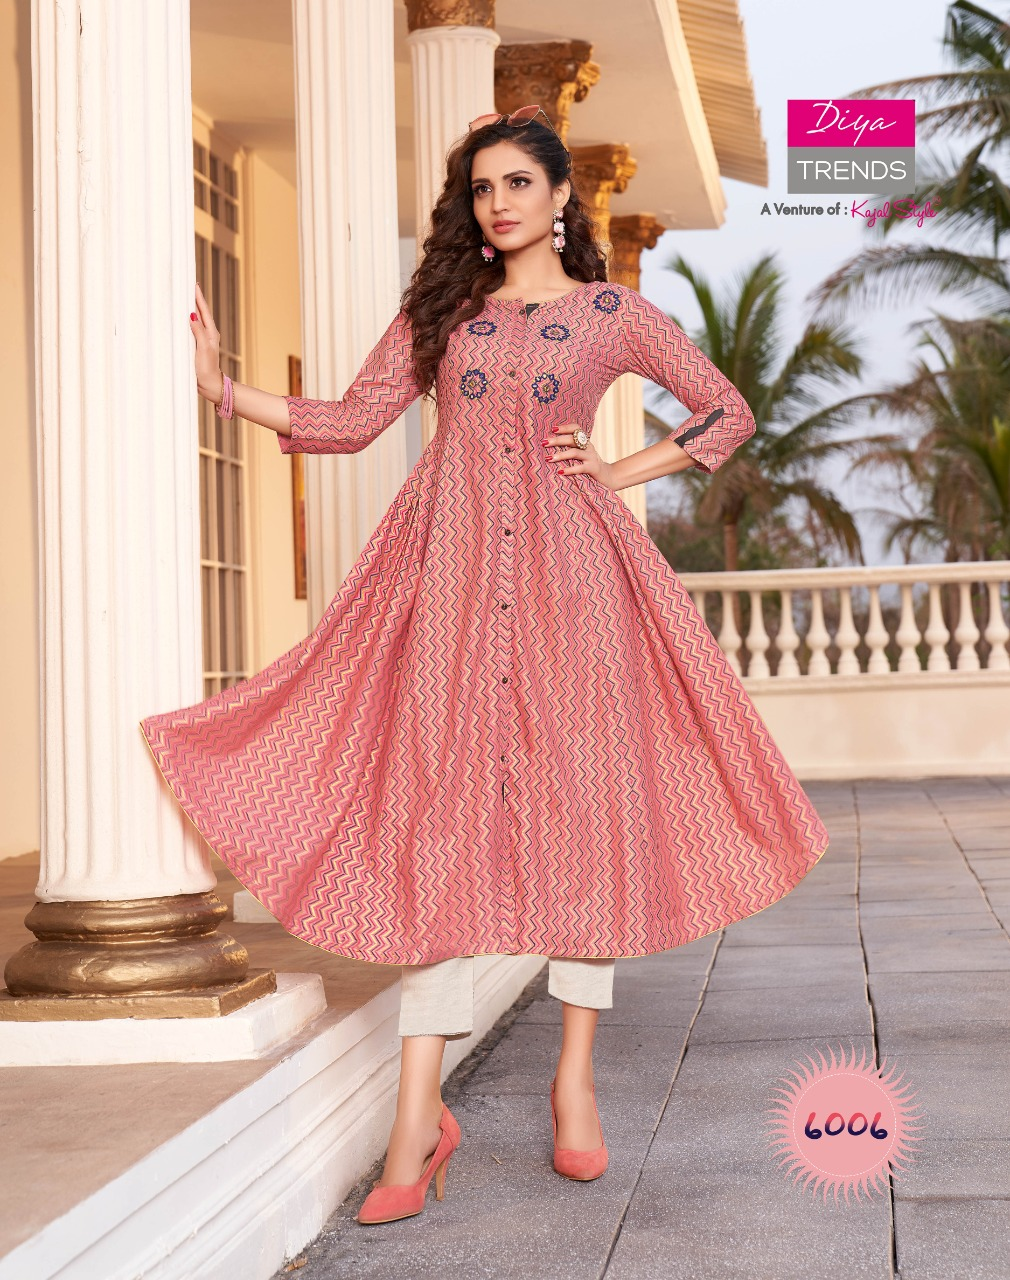 Diya Trends Ethnicity Vol 6  Buy Designer Anarkali kurtis for Women & Girls Online